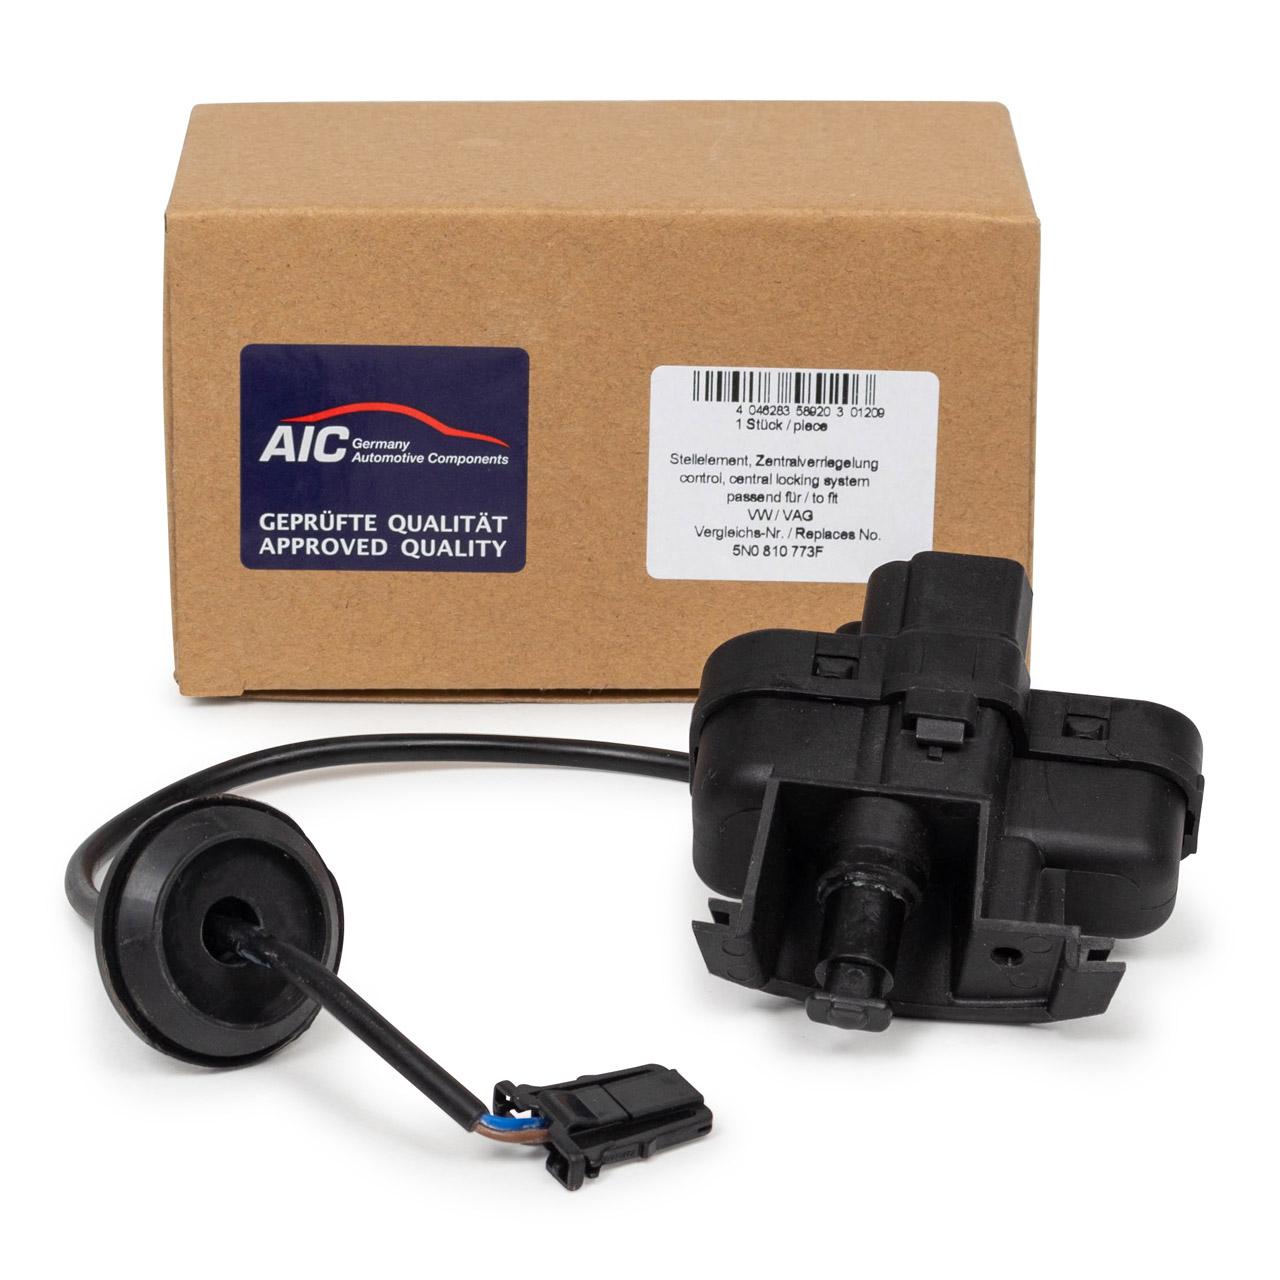 AIC Stellmotor Stellelement Tankklappe Tankdeckel VW Golf 5 6 Variant Tiguan 5N 5N0810773F